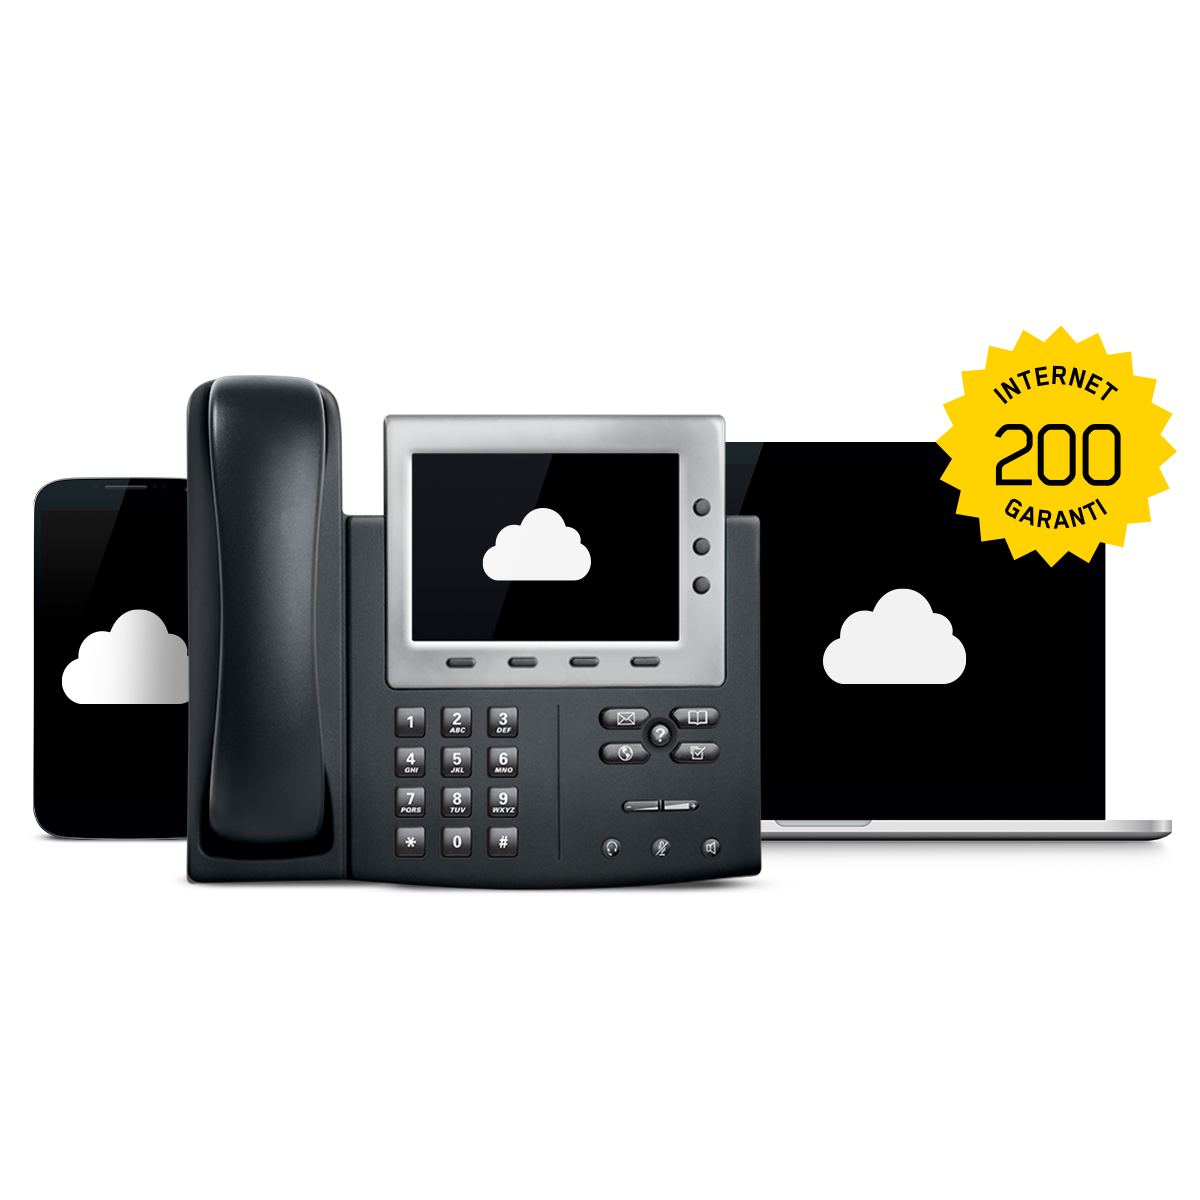 INTERNET GARANTI 200 + COMMUNICATIONS EN NUAGE